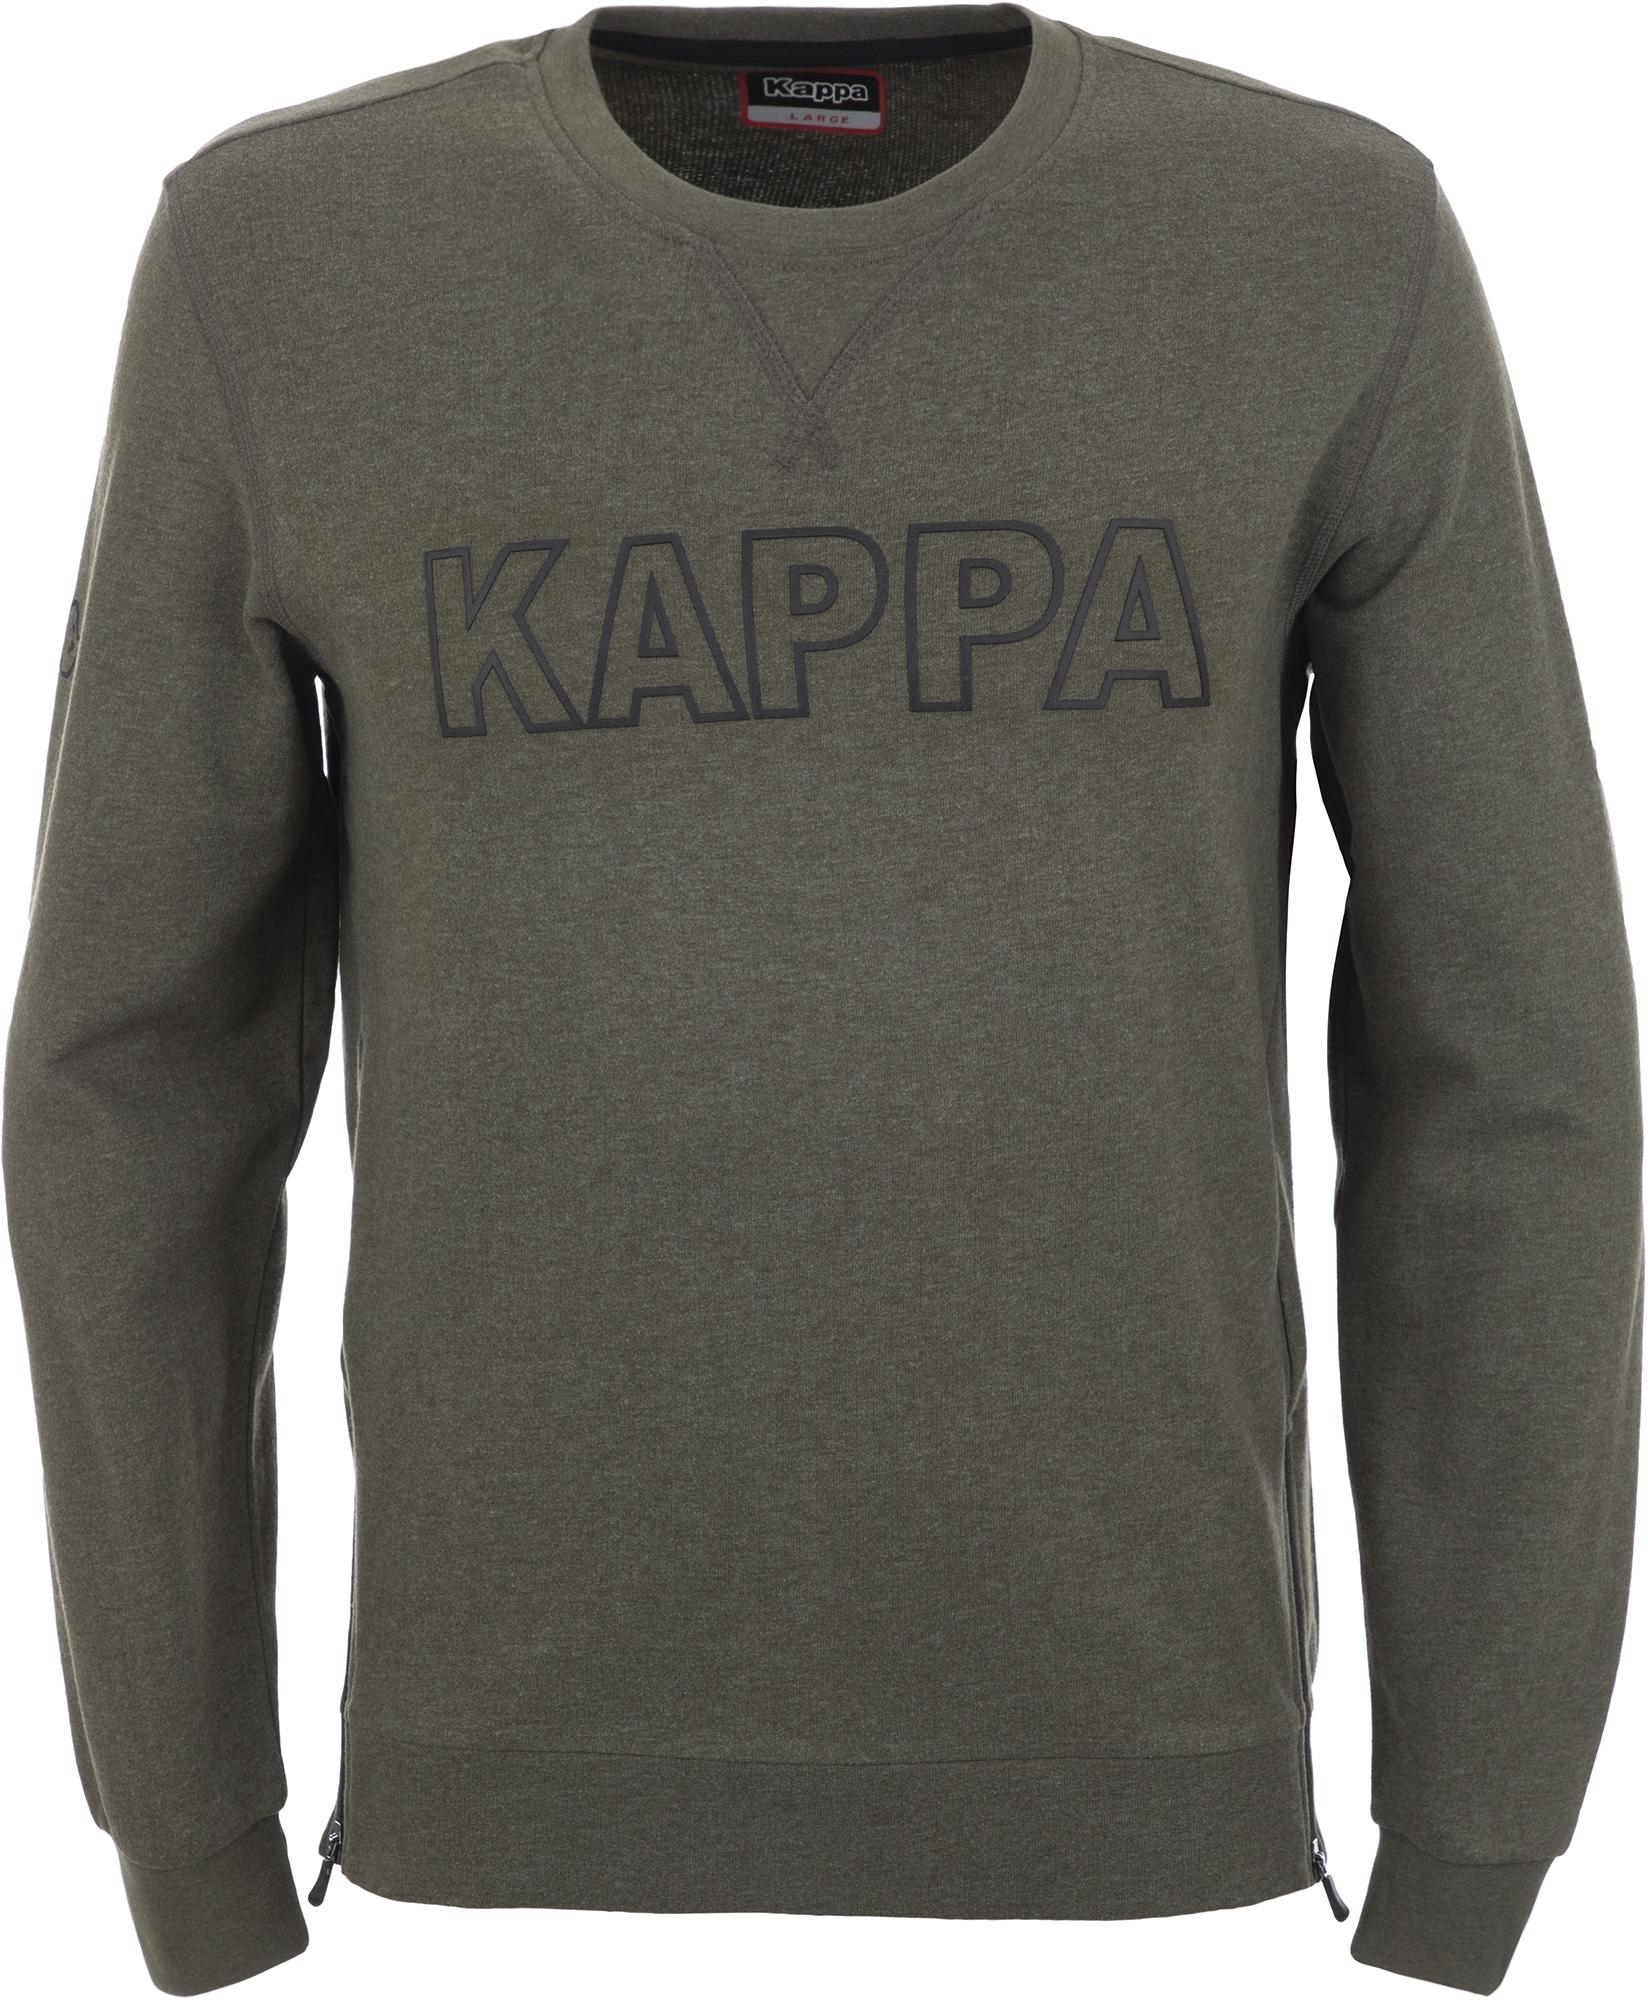 все цены на Kappa Джемпер мужской Kappa, размер 52 онлайн